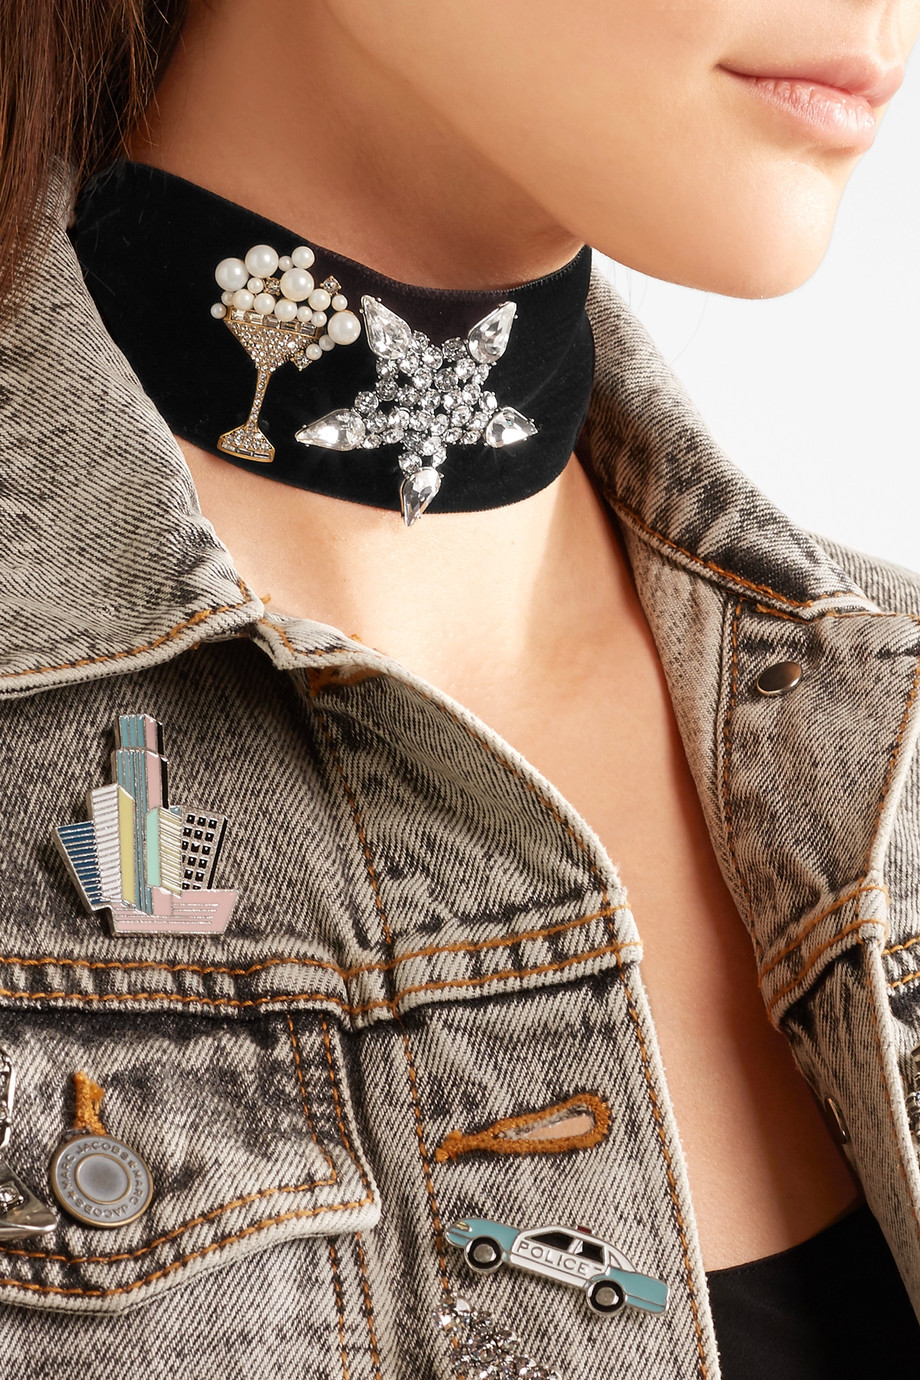 Marc Jacobs Velvet, Swarovski crystal and faux pearl choker $350